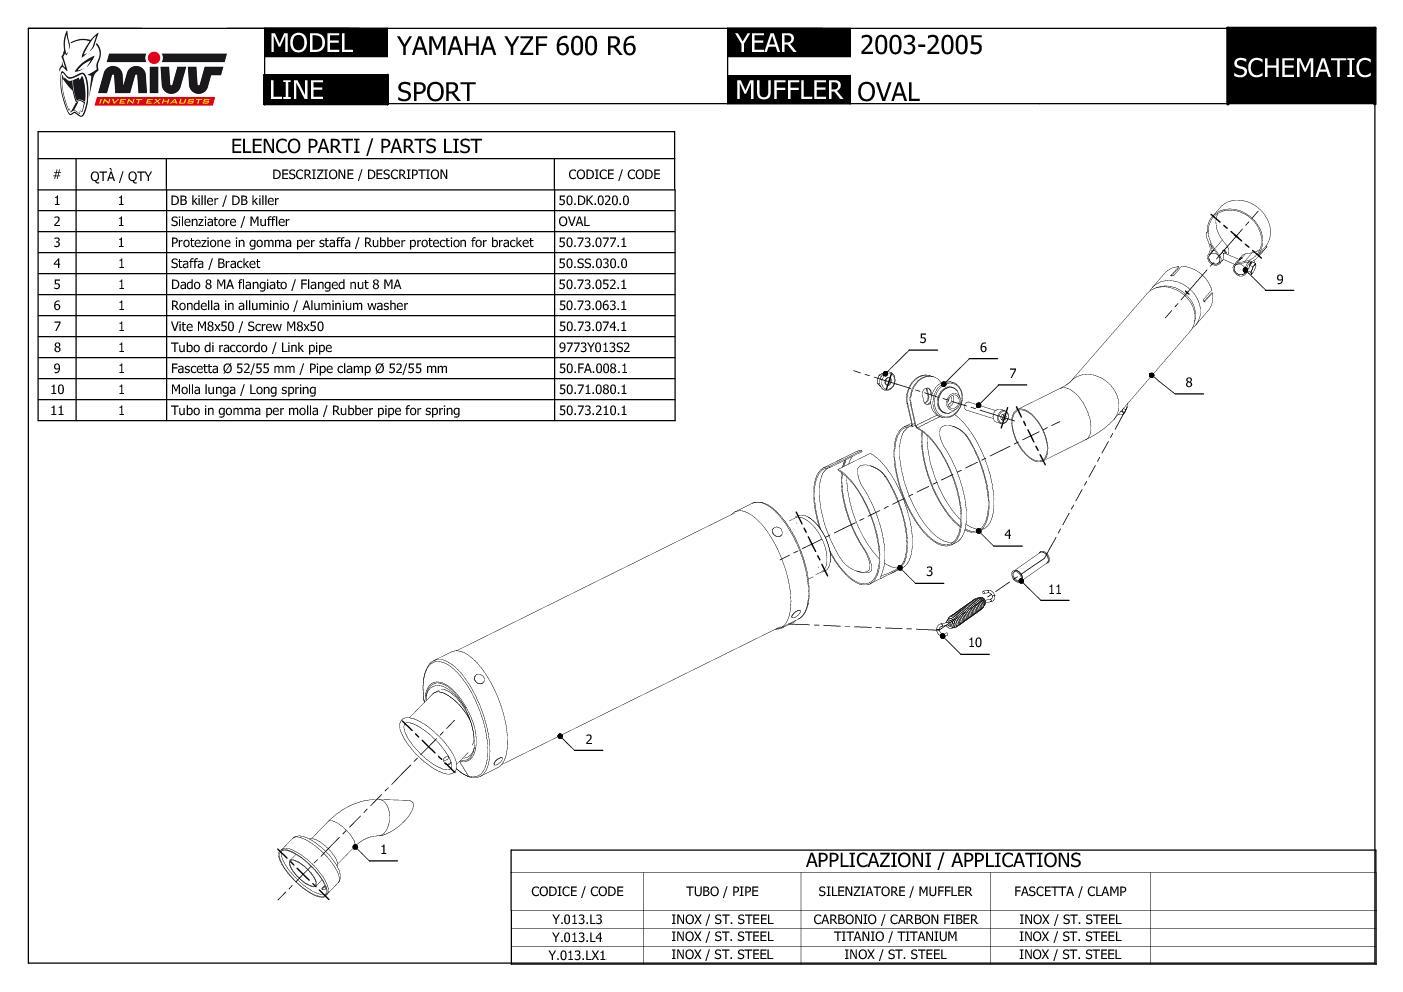 Mivv Exhaust Muffler Oval Carbon Fiber for Yamaha Yzf 600